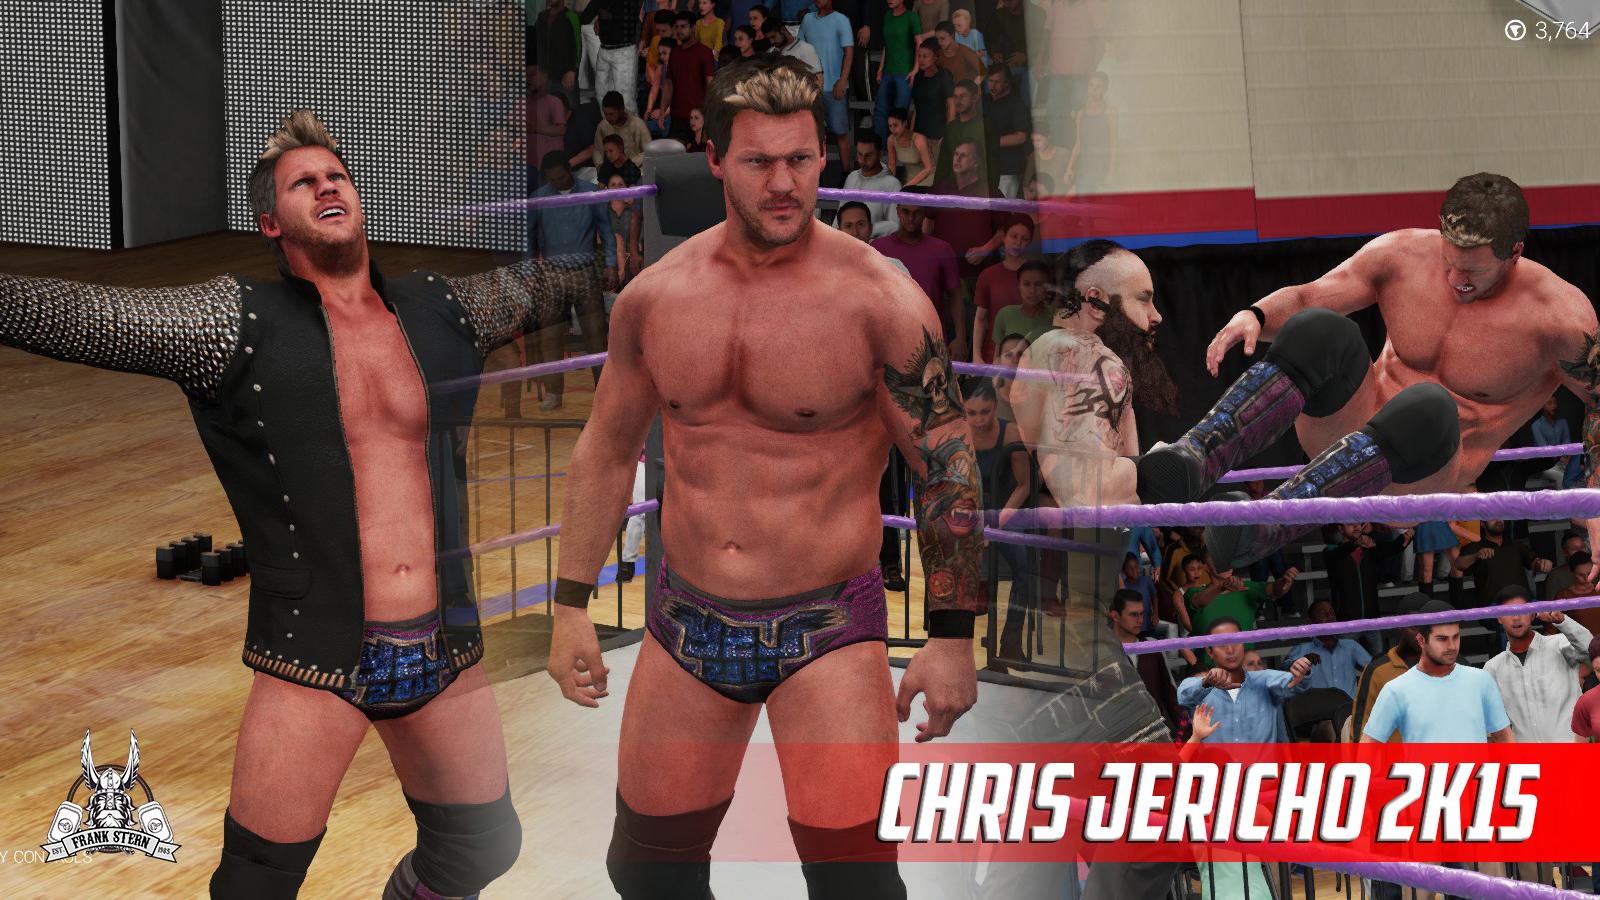 Preview-CHRIS-JERICHO-2-K15.jpg